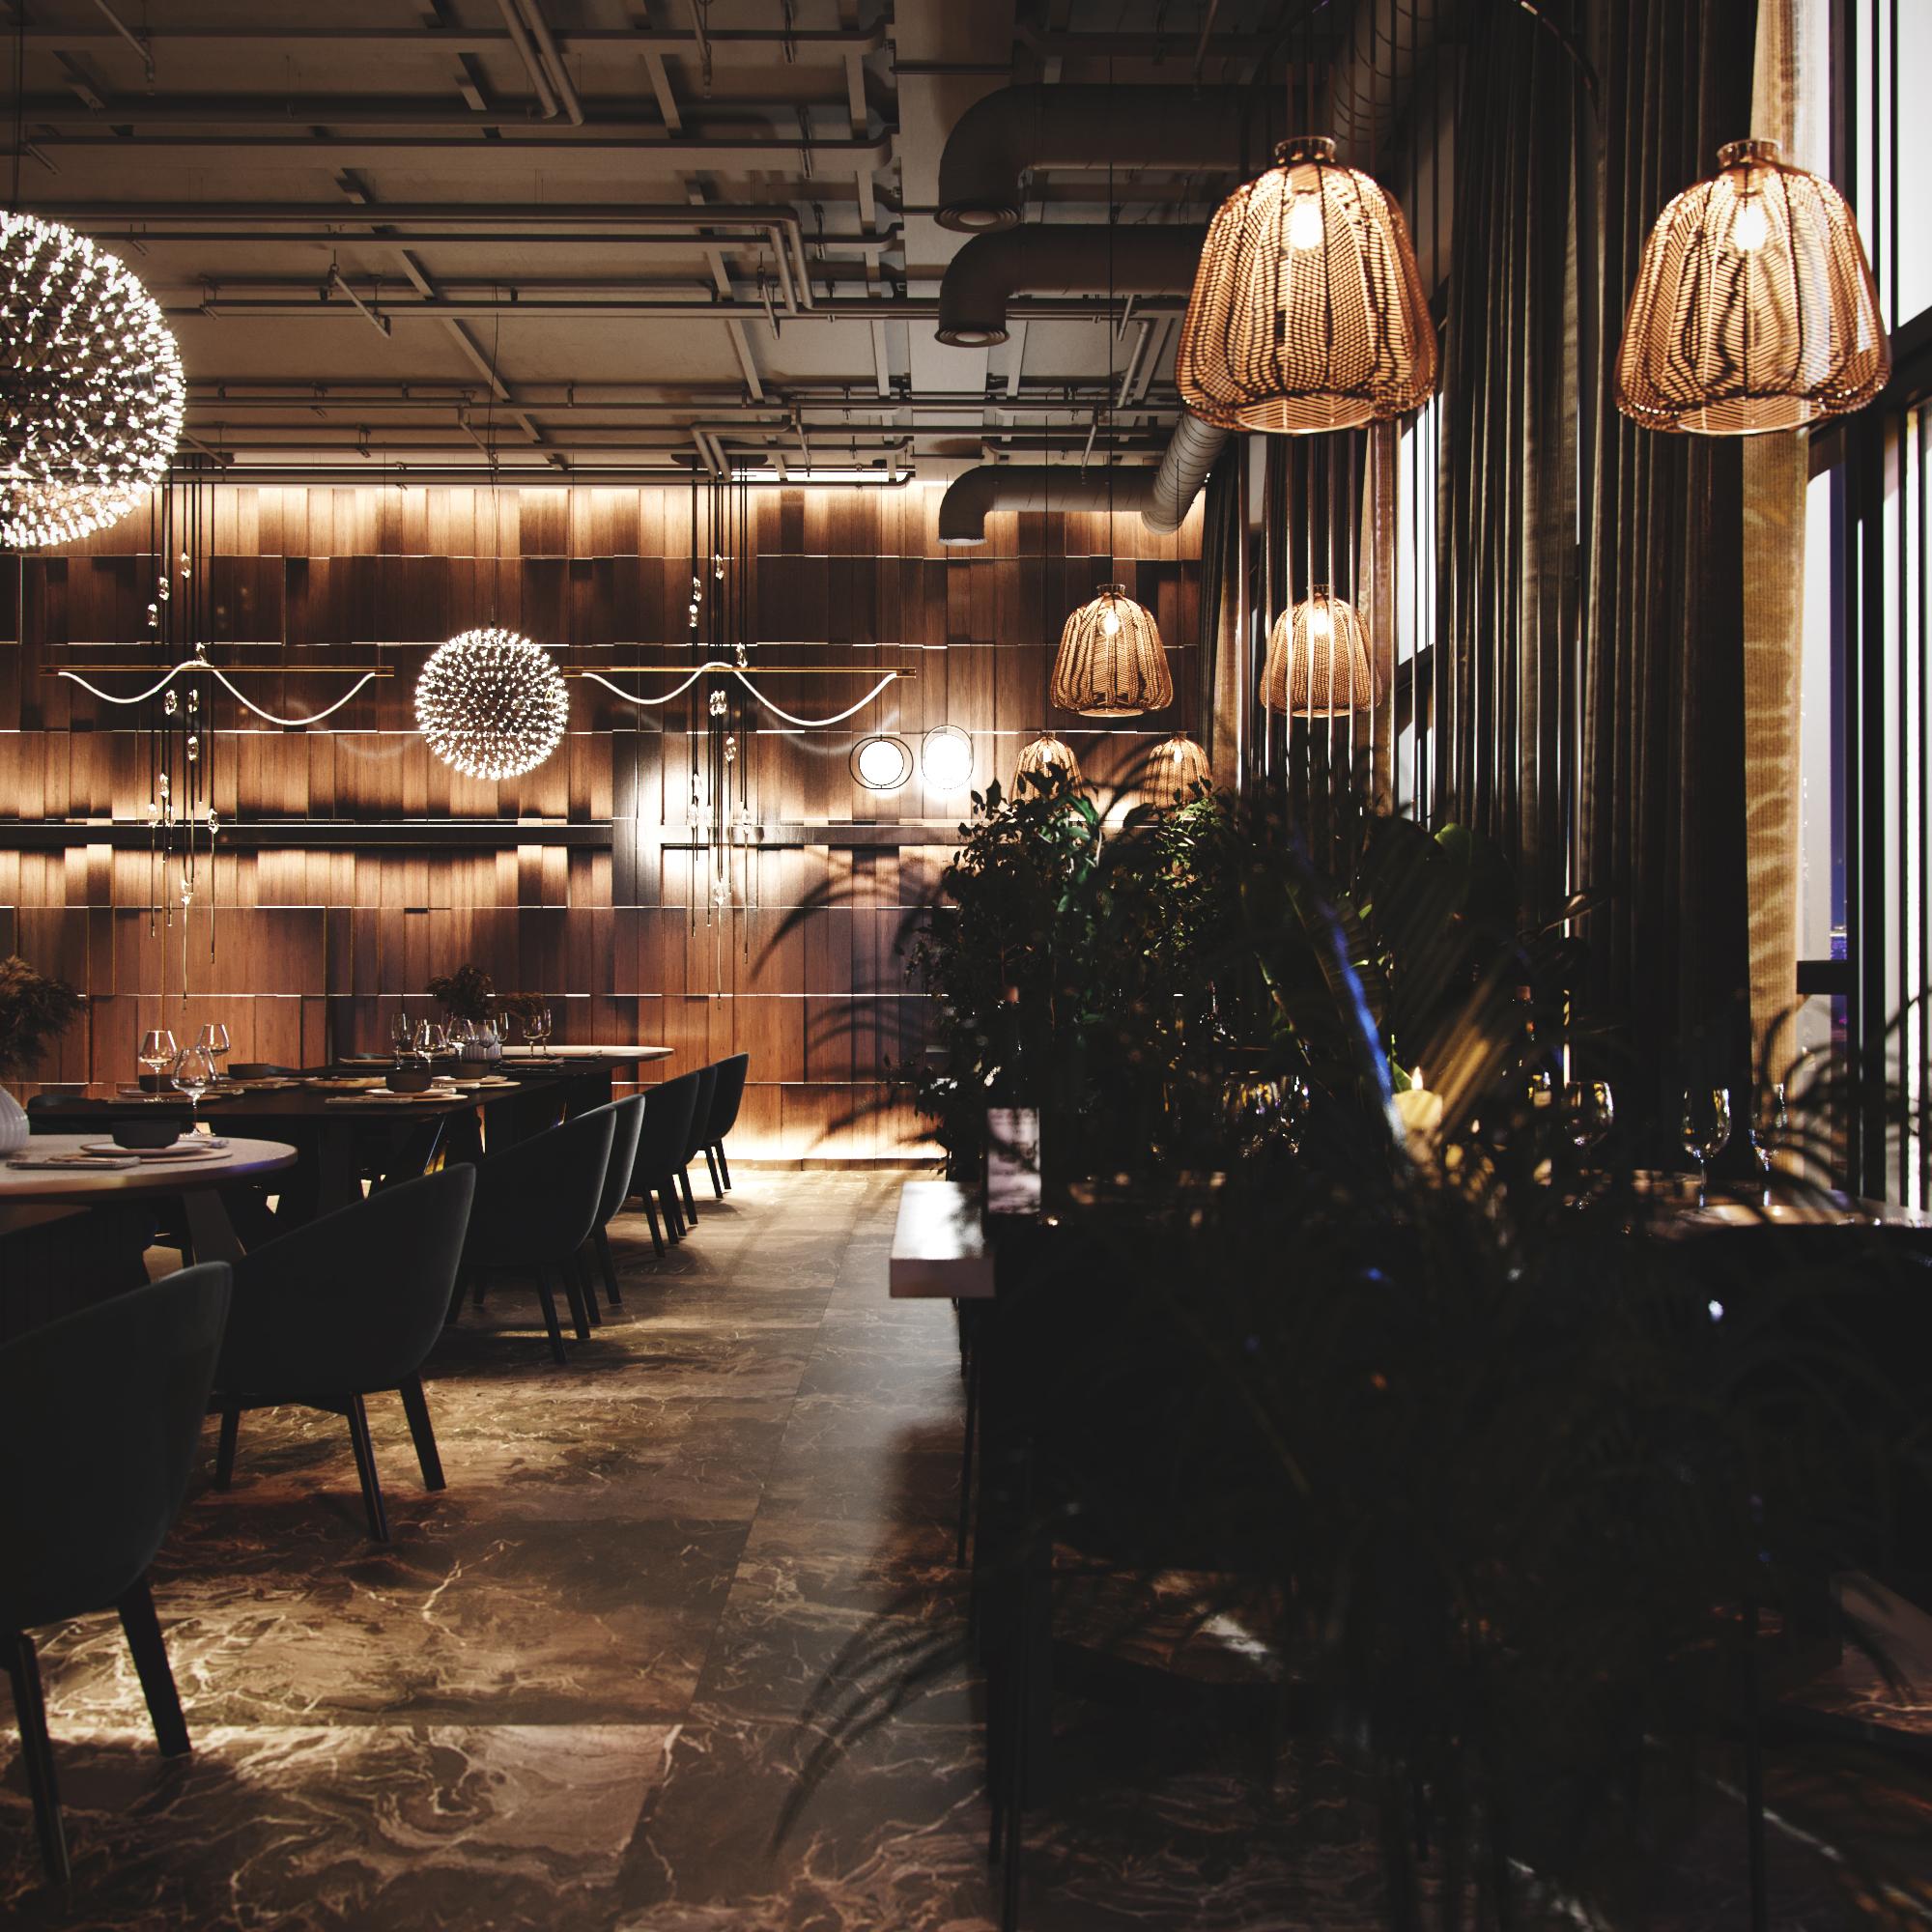 Интерьер ресторана. Вид 3.